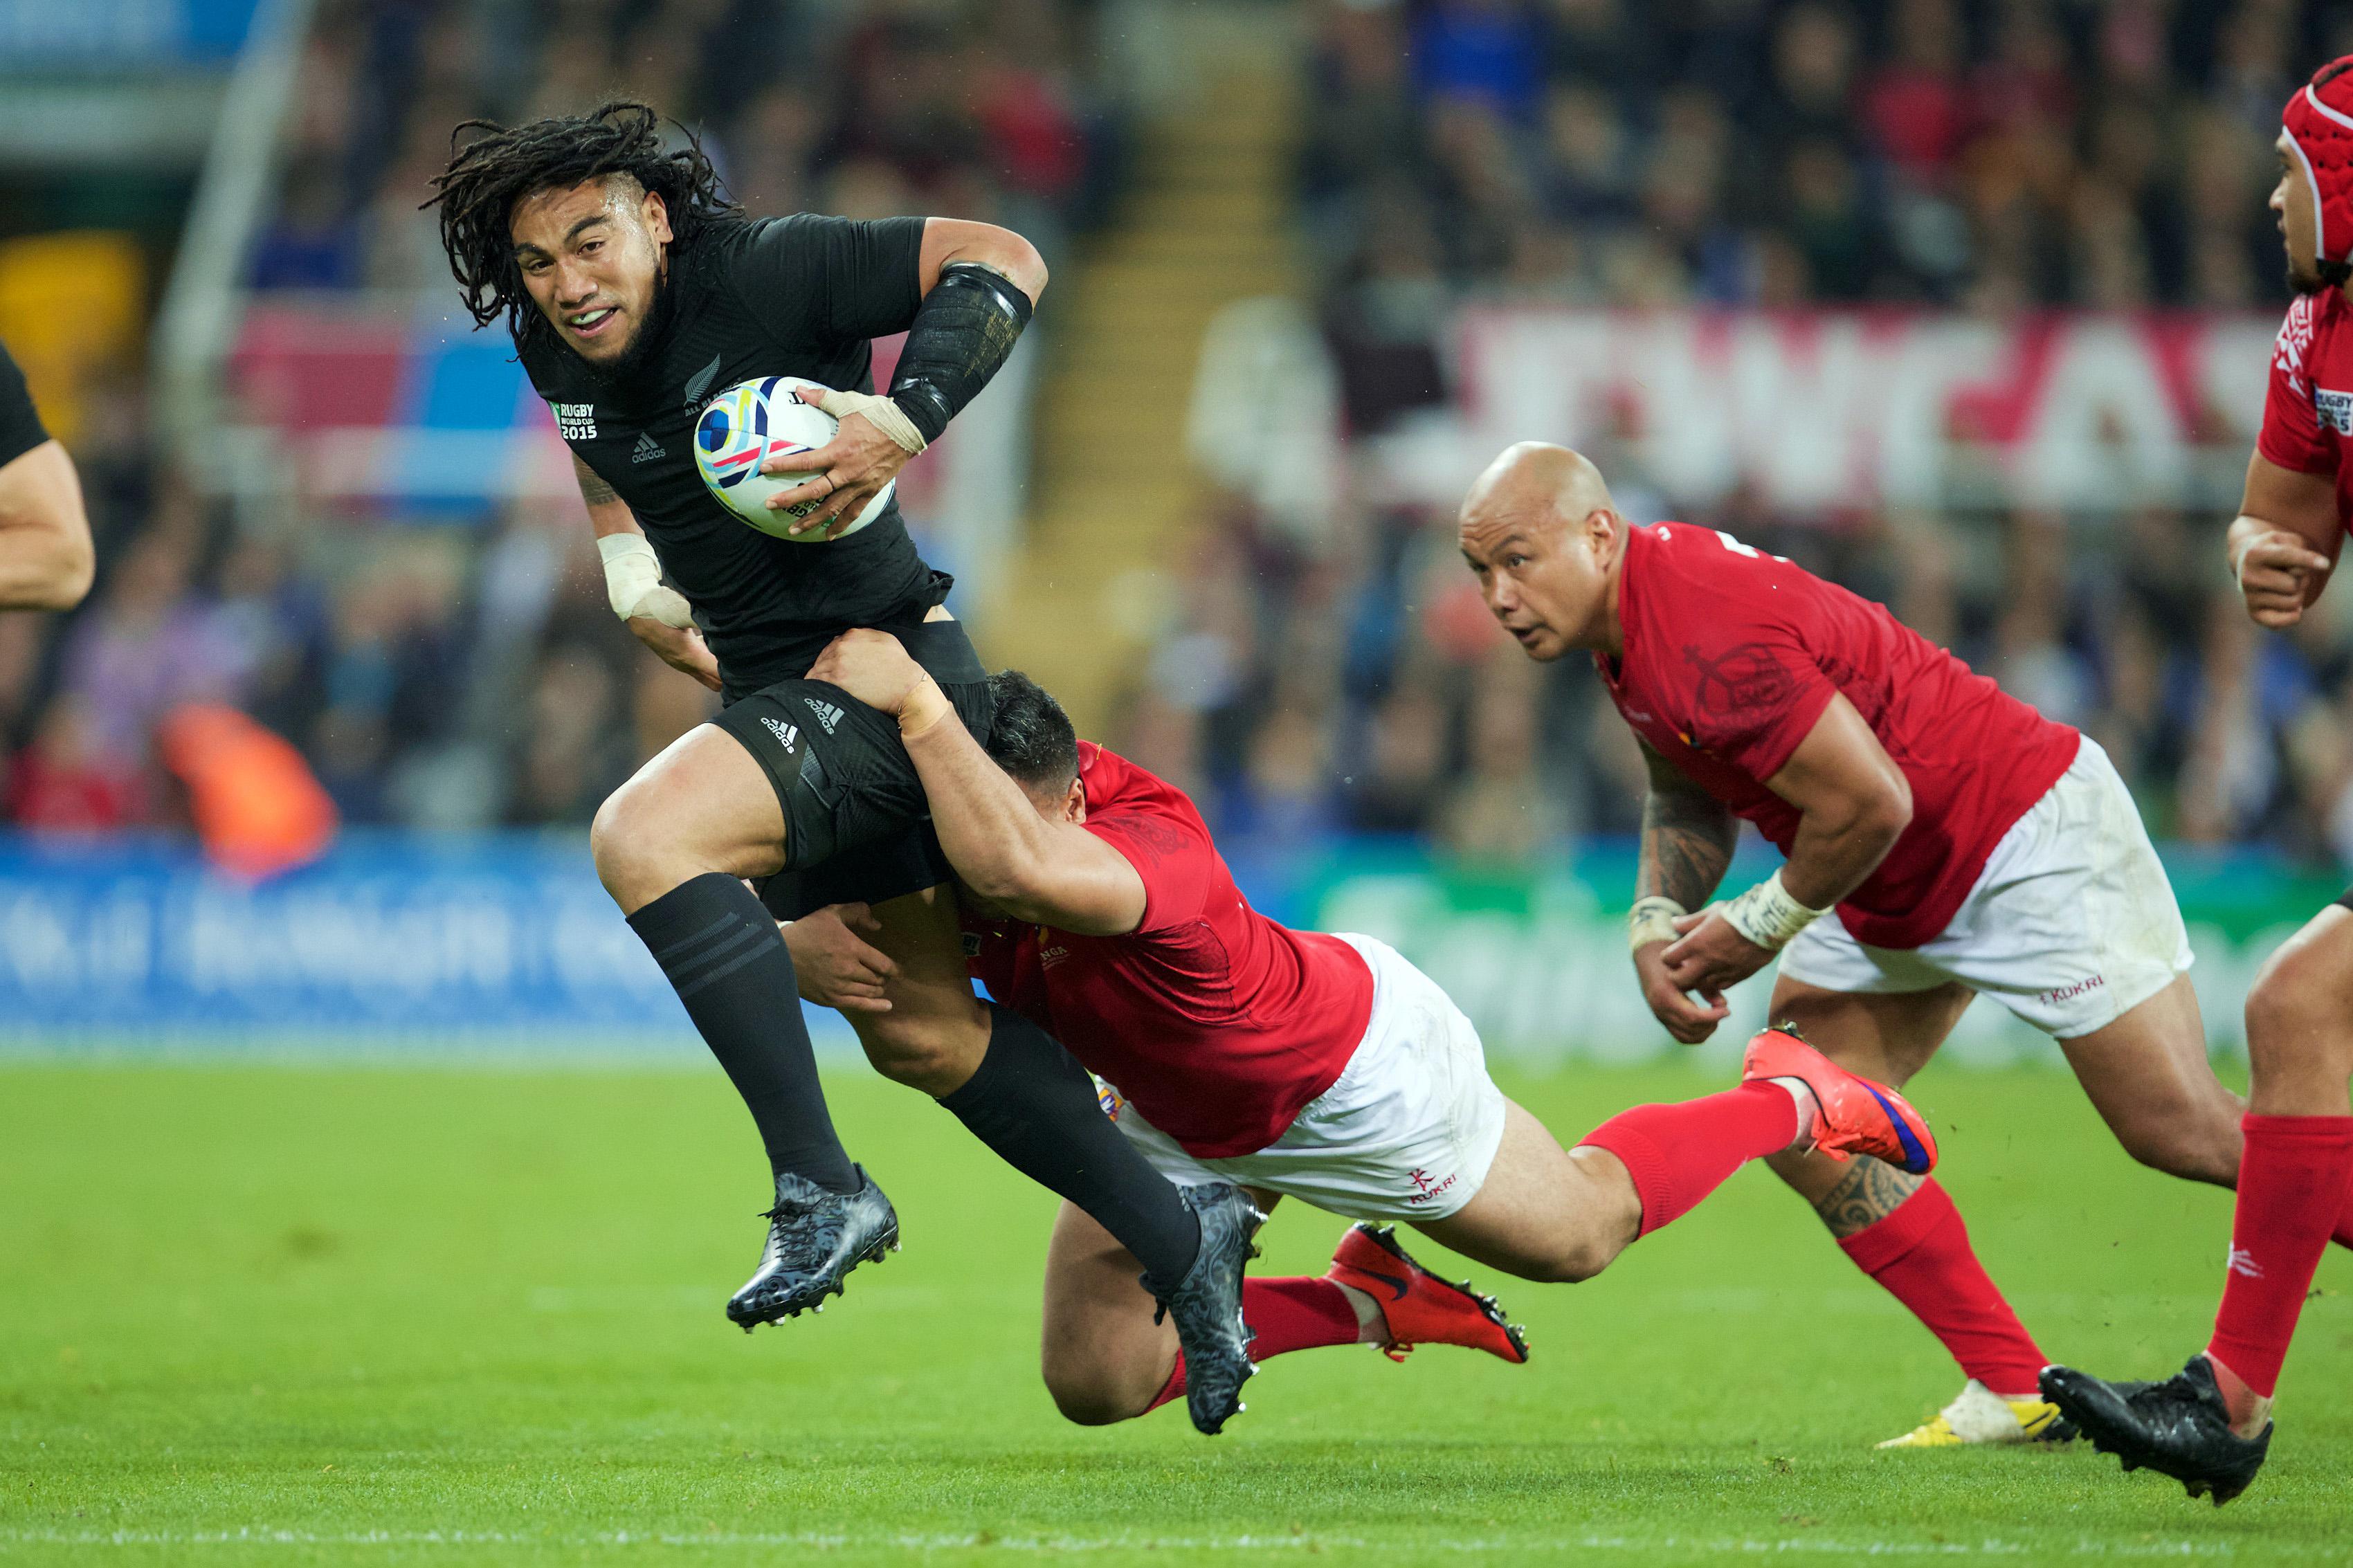 Rugby 15 Skidrow, crack Keygen Free Download - video dailymotion